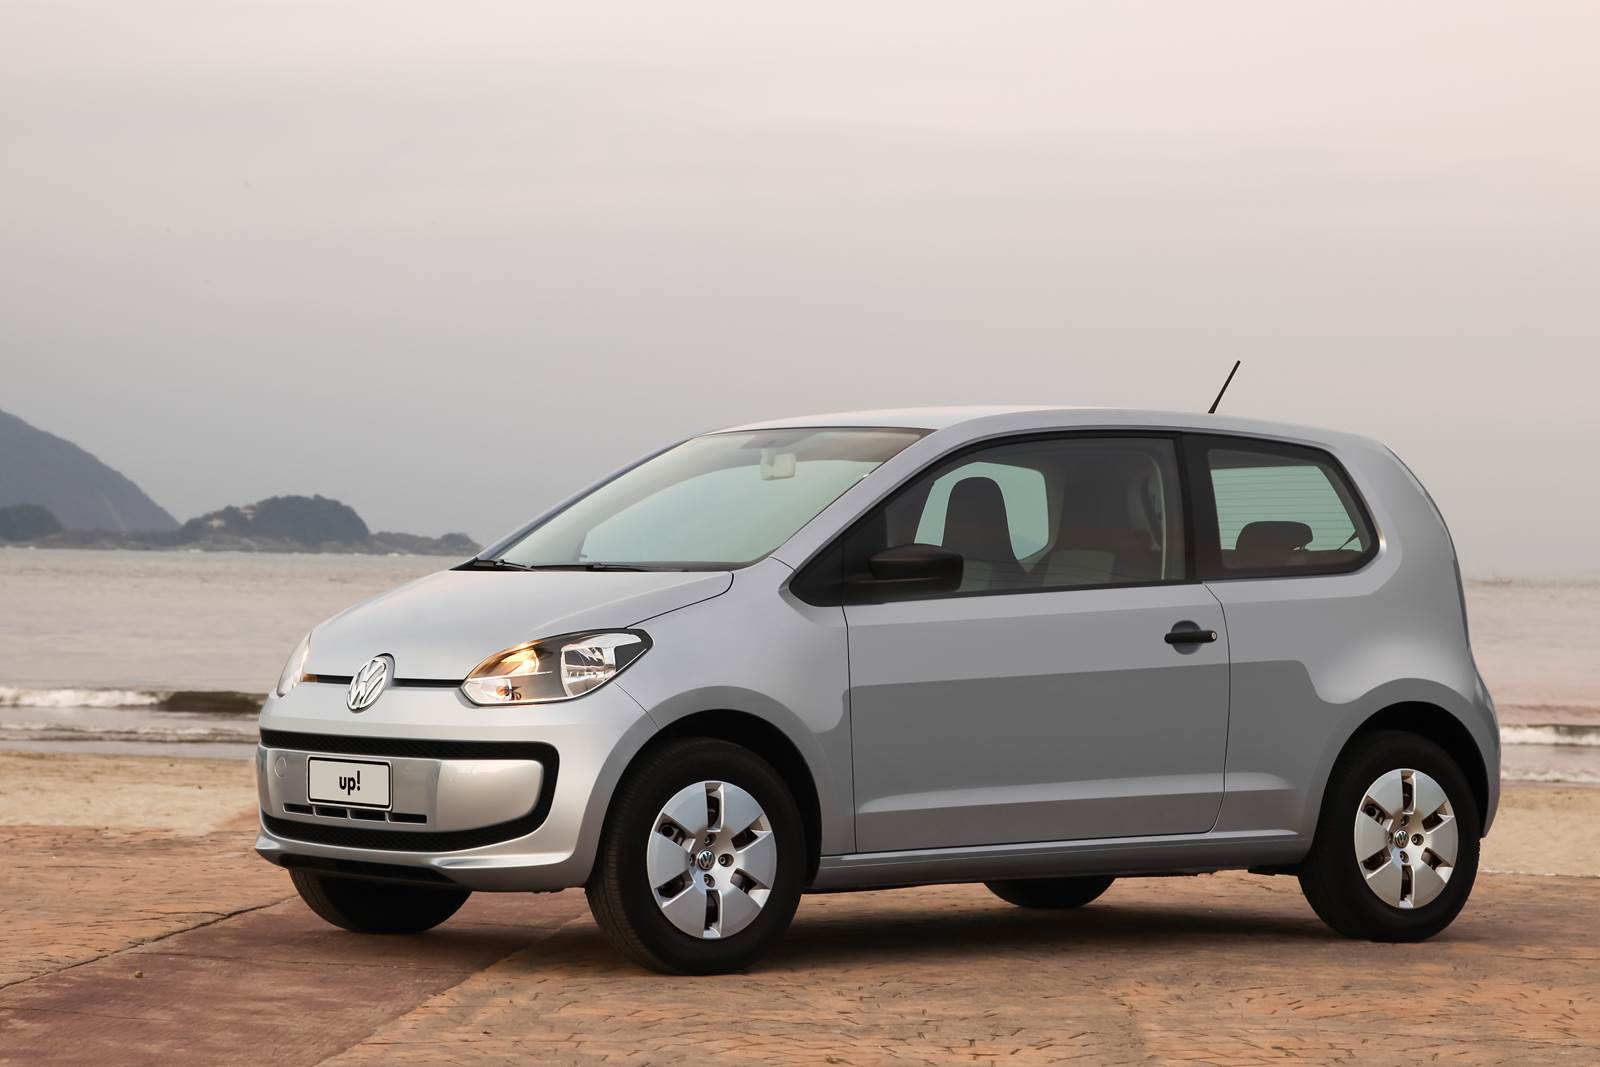 Volkswagen Take-up!